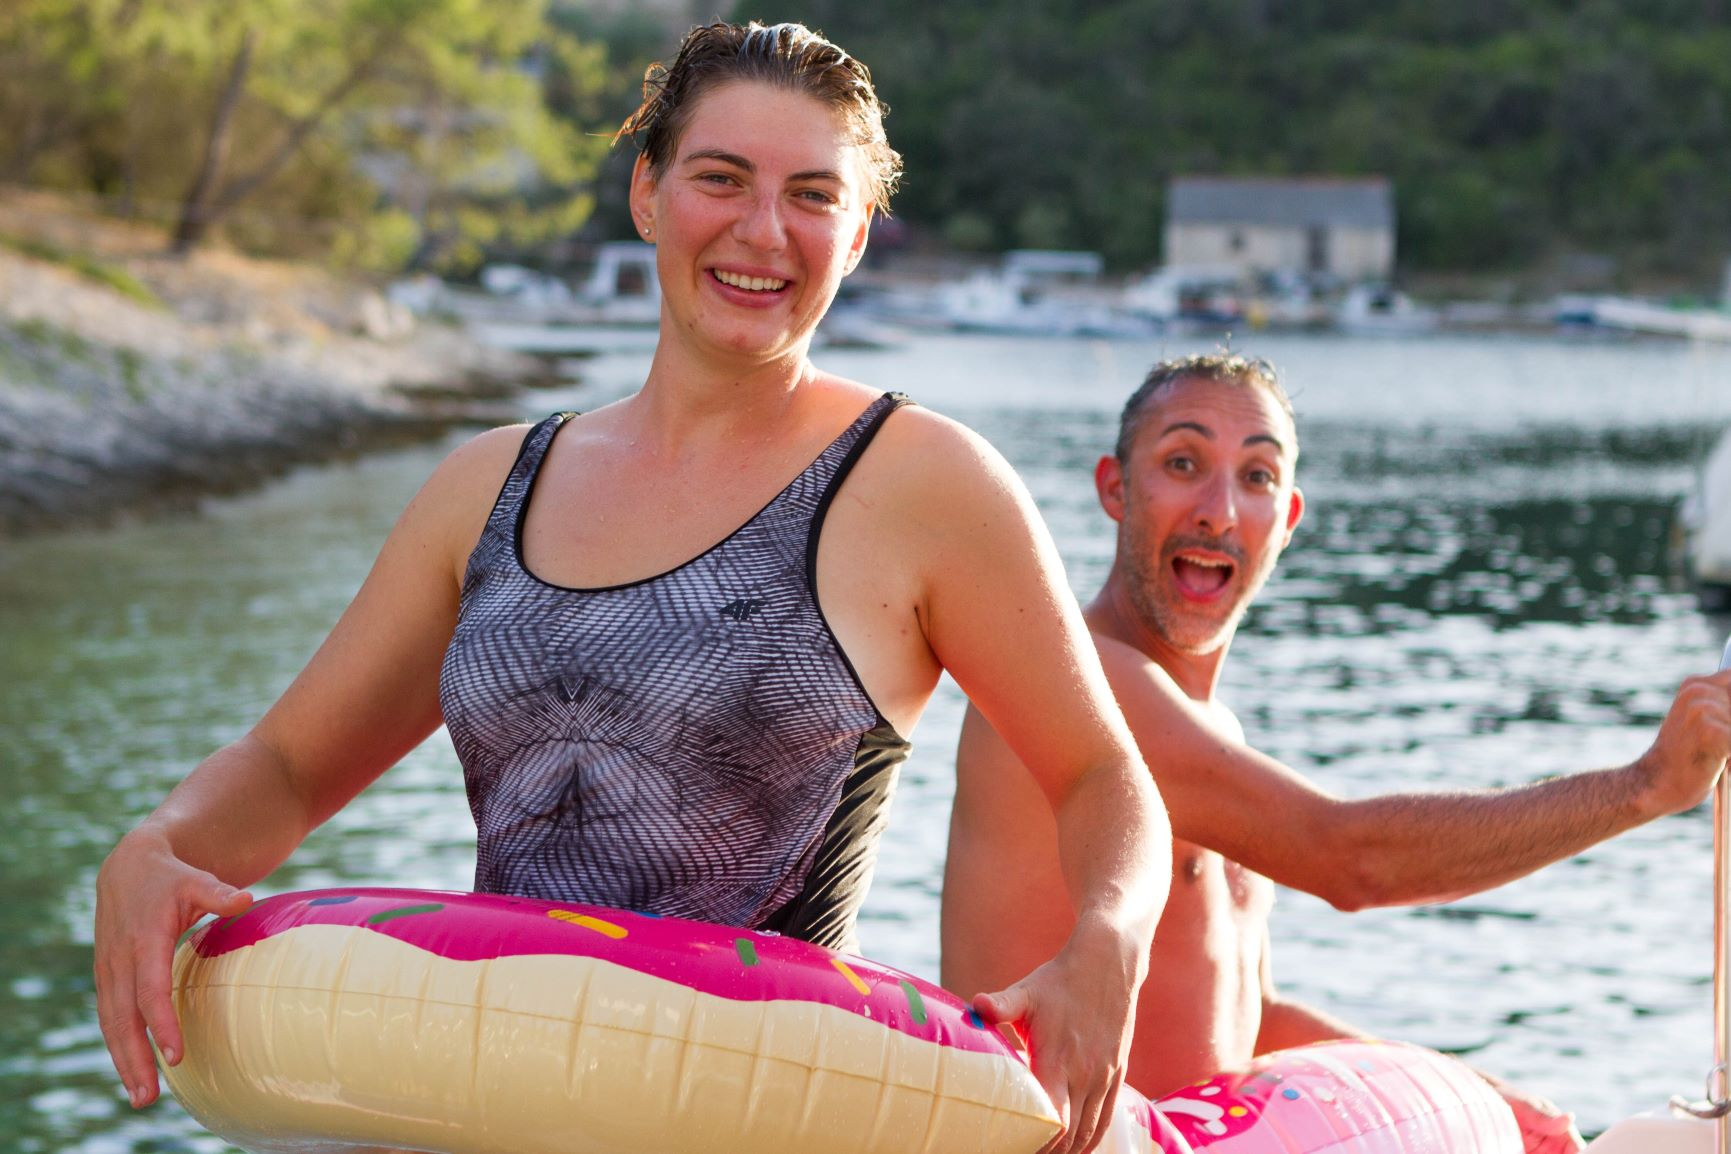 Floatation device fun on the Adriatic_Da